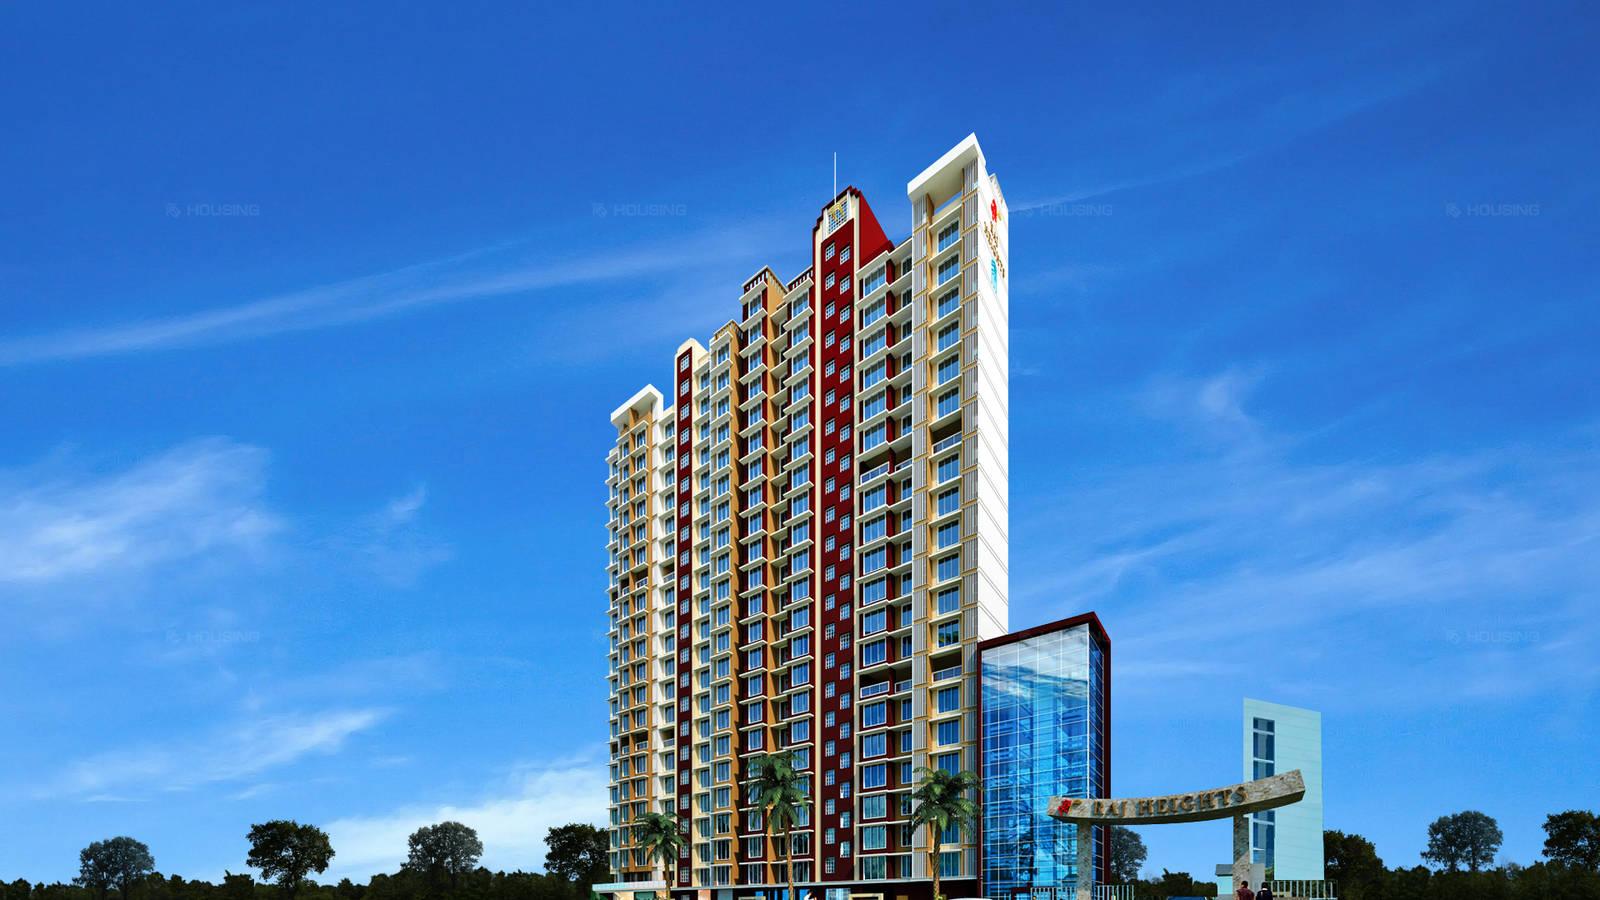 Residential Multistorey Apartment for Sale in Sion - Matunga, G.T.B. Nagar , Matunga-West, Mumbai